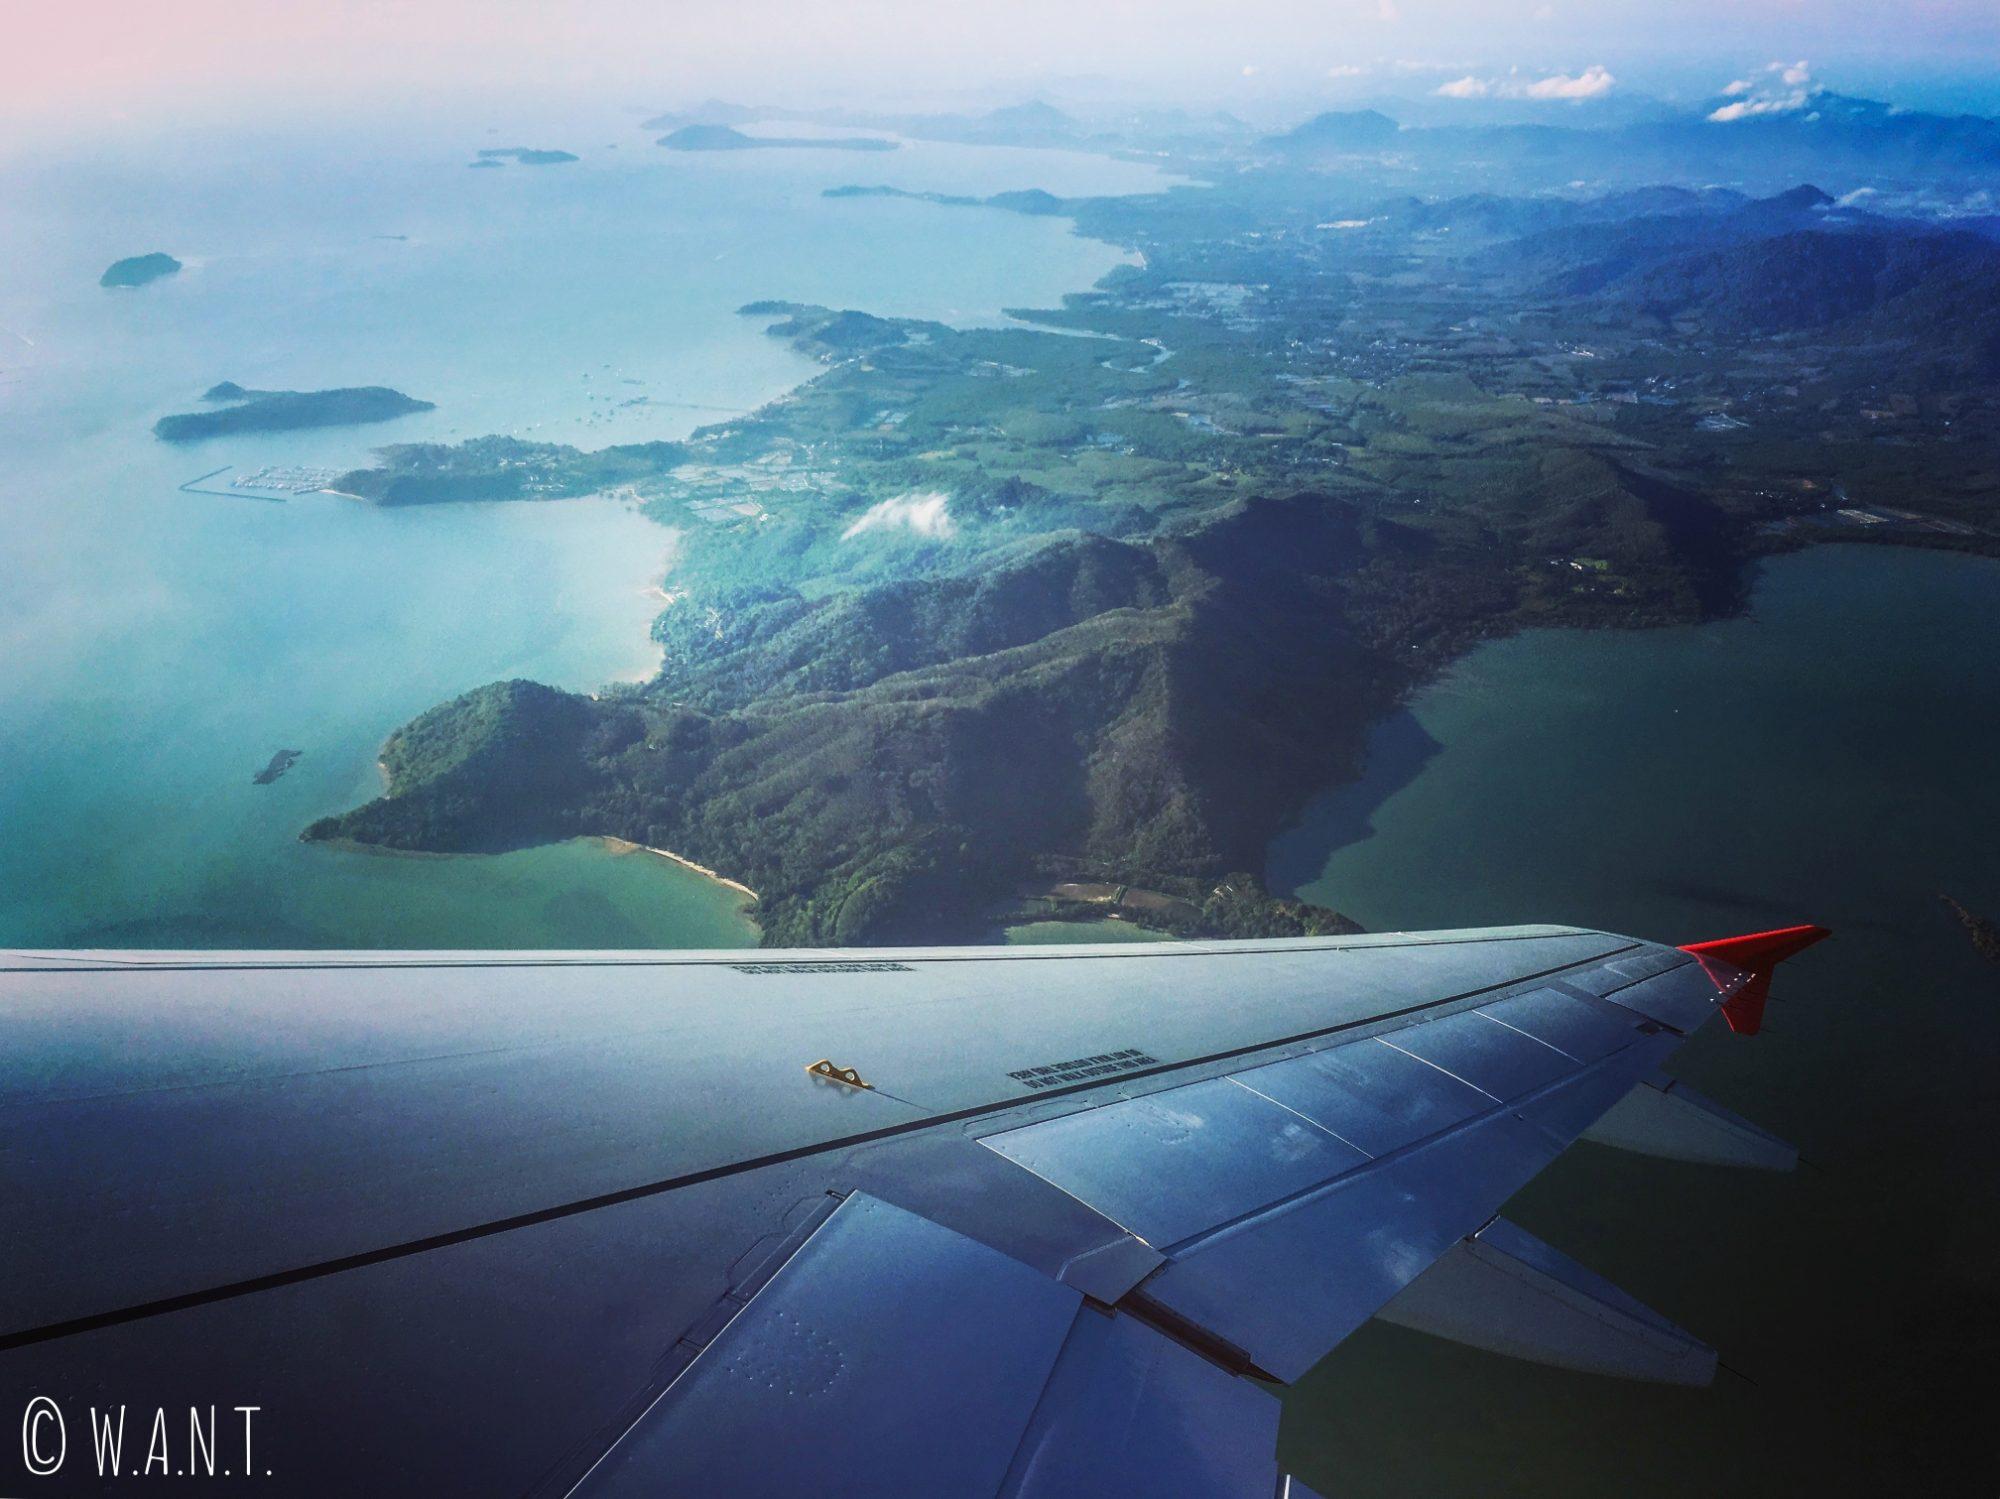 Vue depuis le vol Kuala Lumpur à Miri